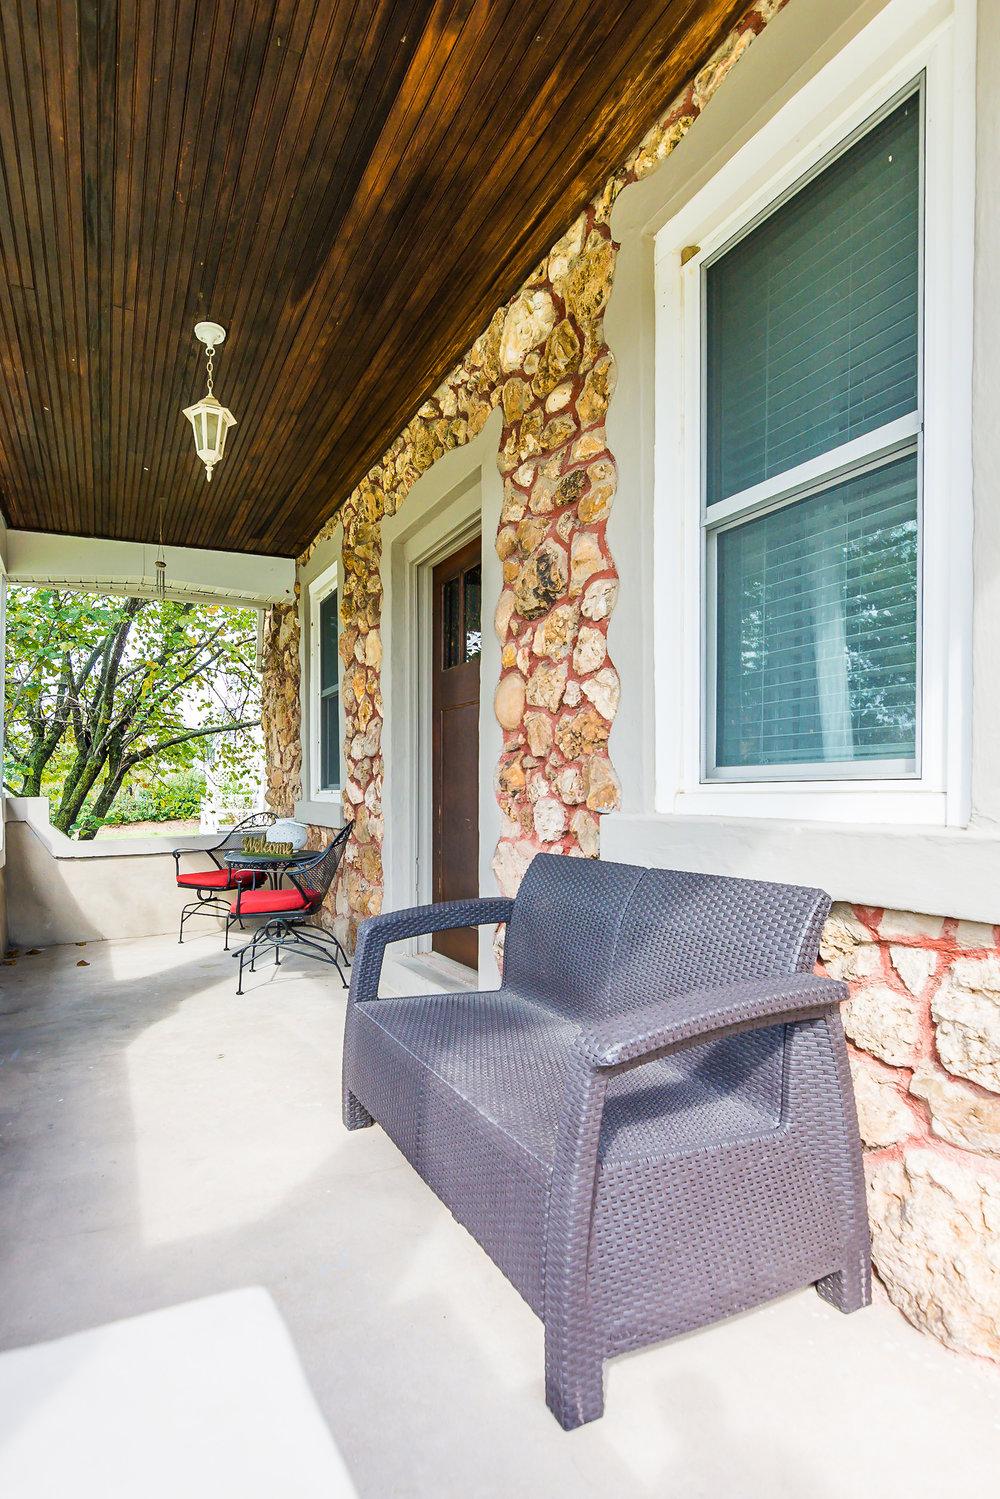 Stone-Cottage-Hermann-Missouri-vacation-rental-02-1004.jpg